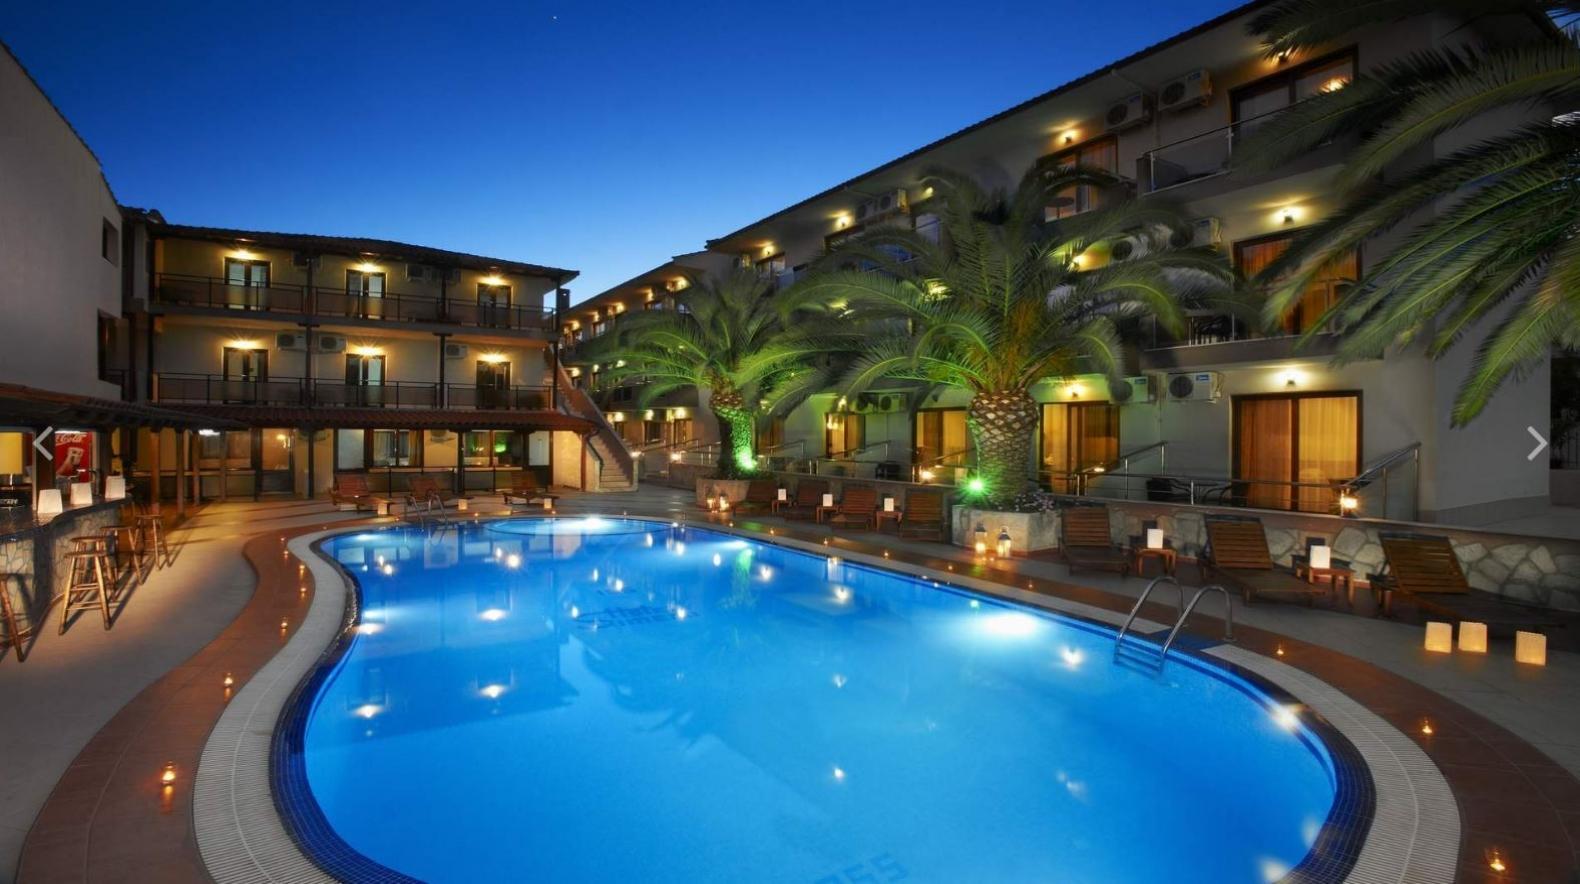 Simeon Hotel - Μεταμόρφωση, Χαλκιδική ✦ 4 Ημέρες (3